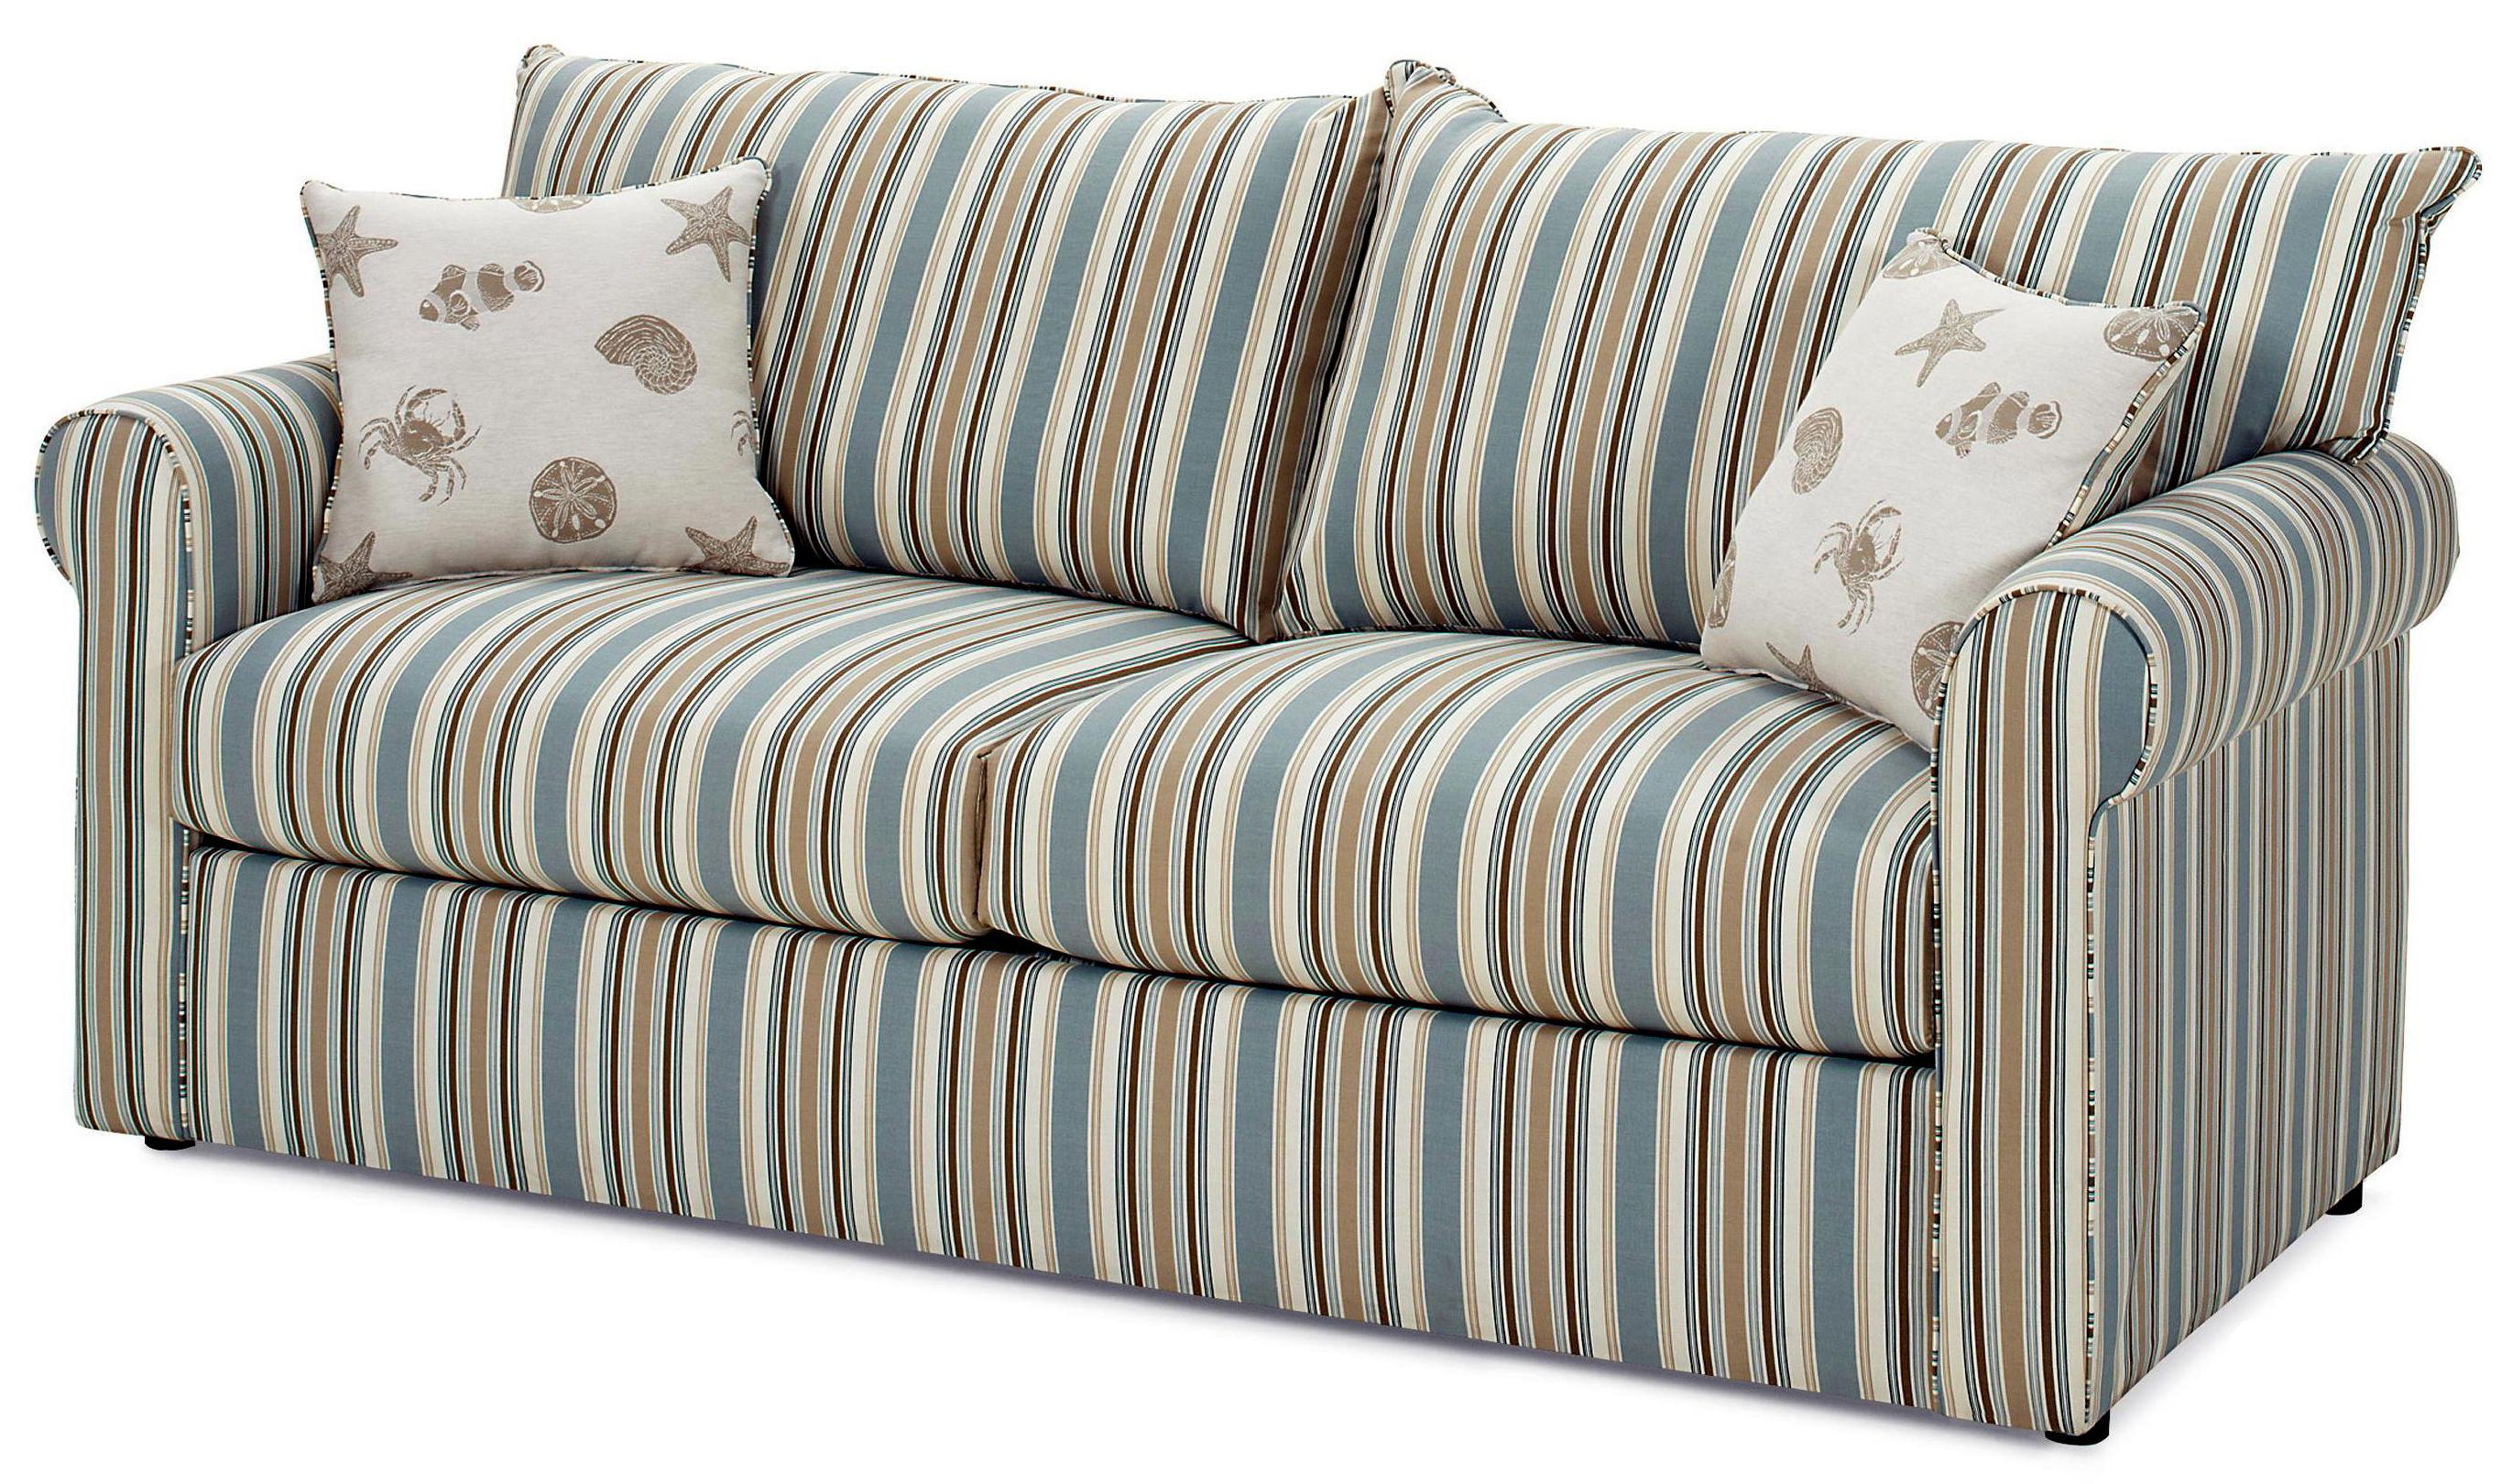 79 Frame Full Sleeper by Overnight Sofa at Dream Home Interiors